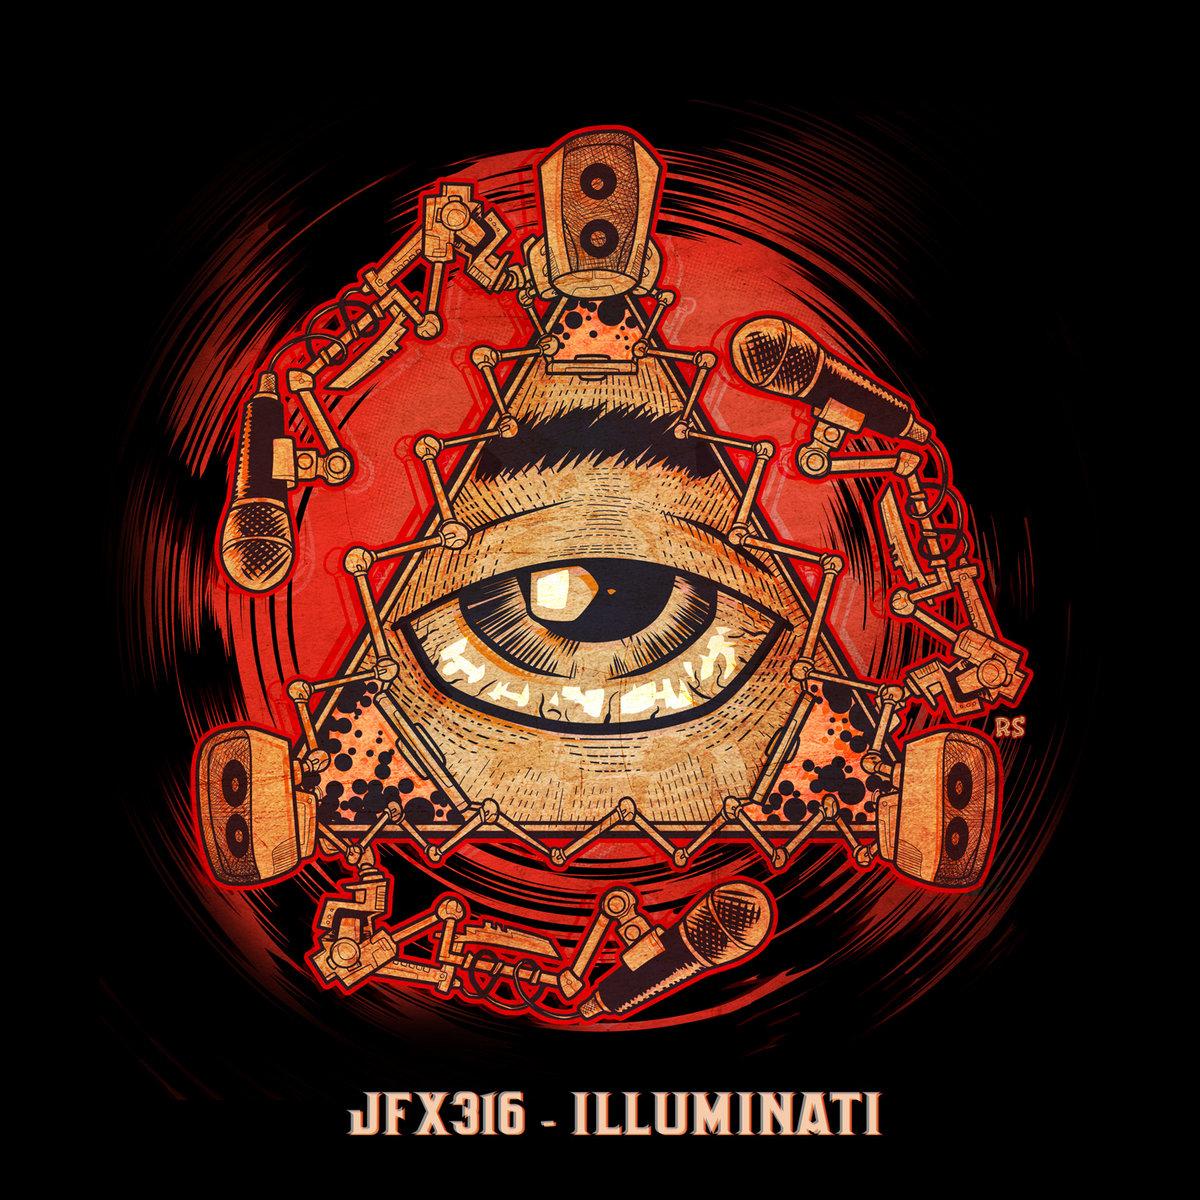 Illuminati Art TumblrIlluminati Art Tumblr